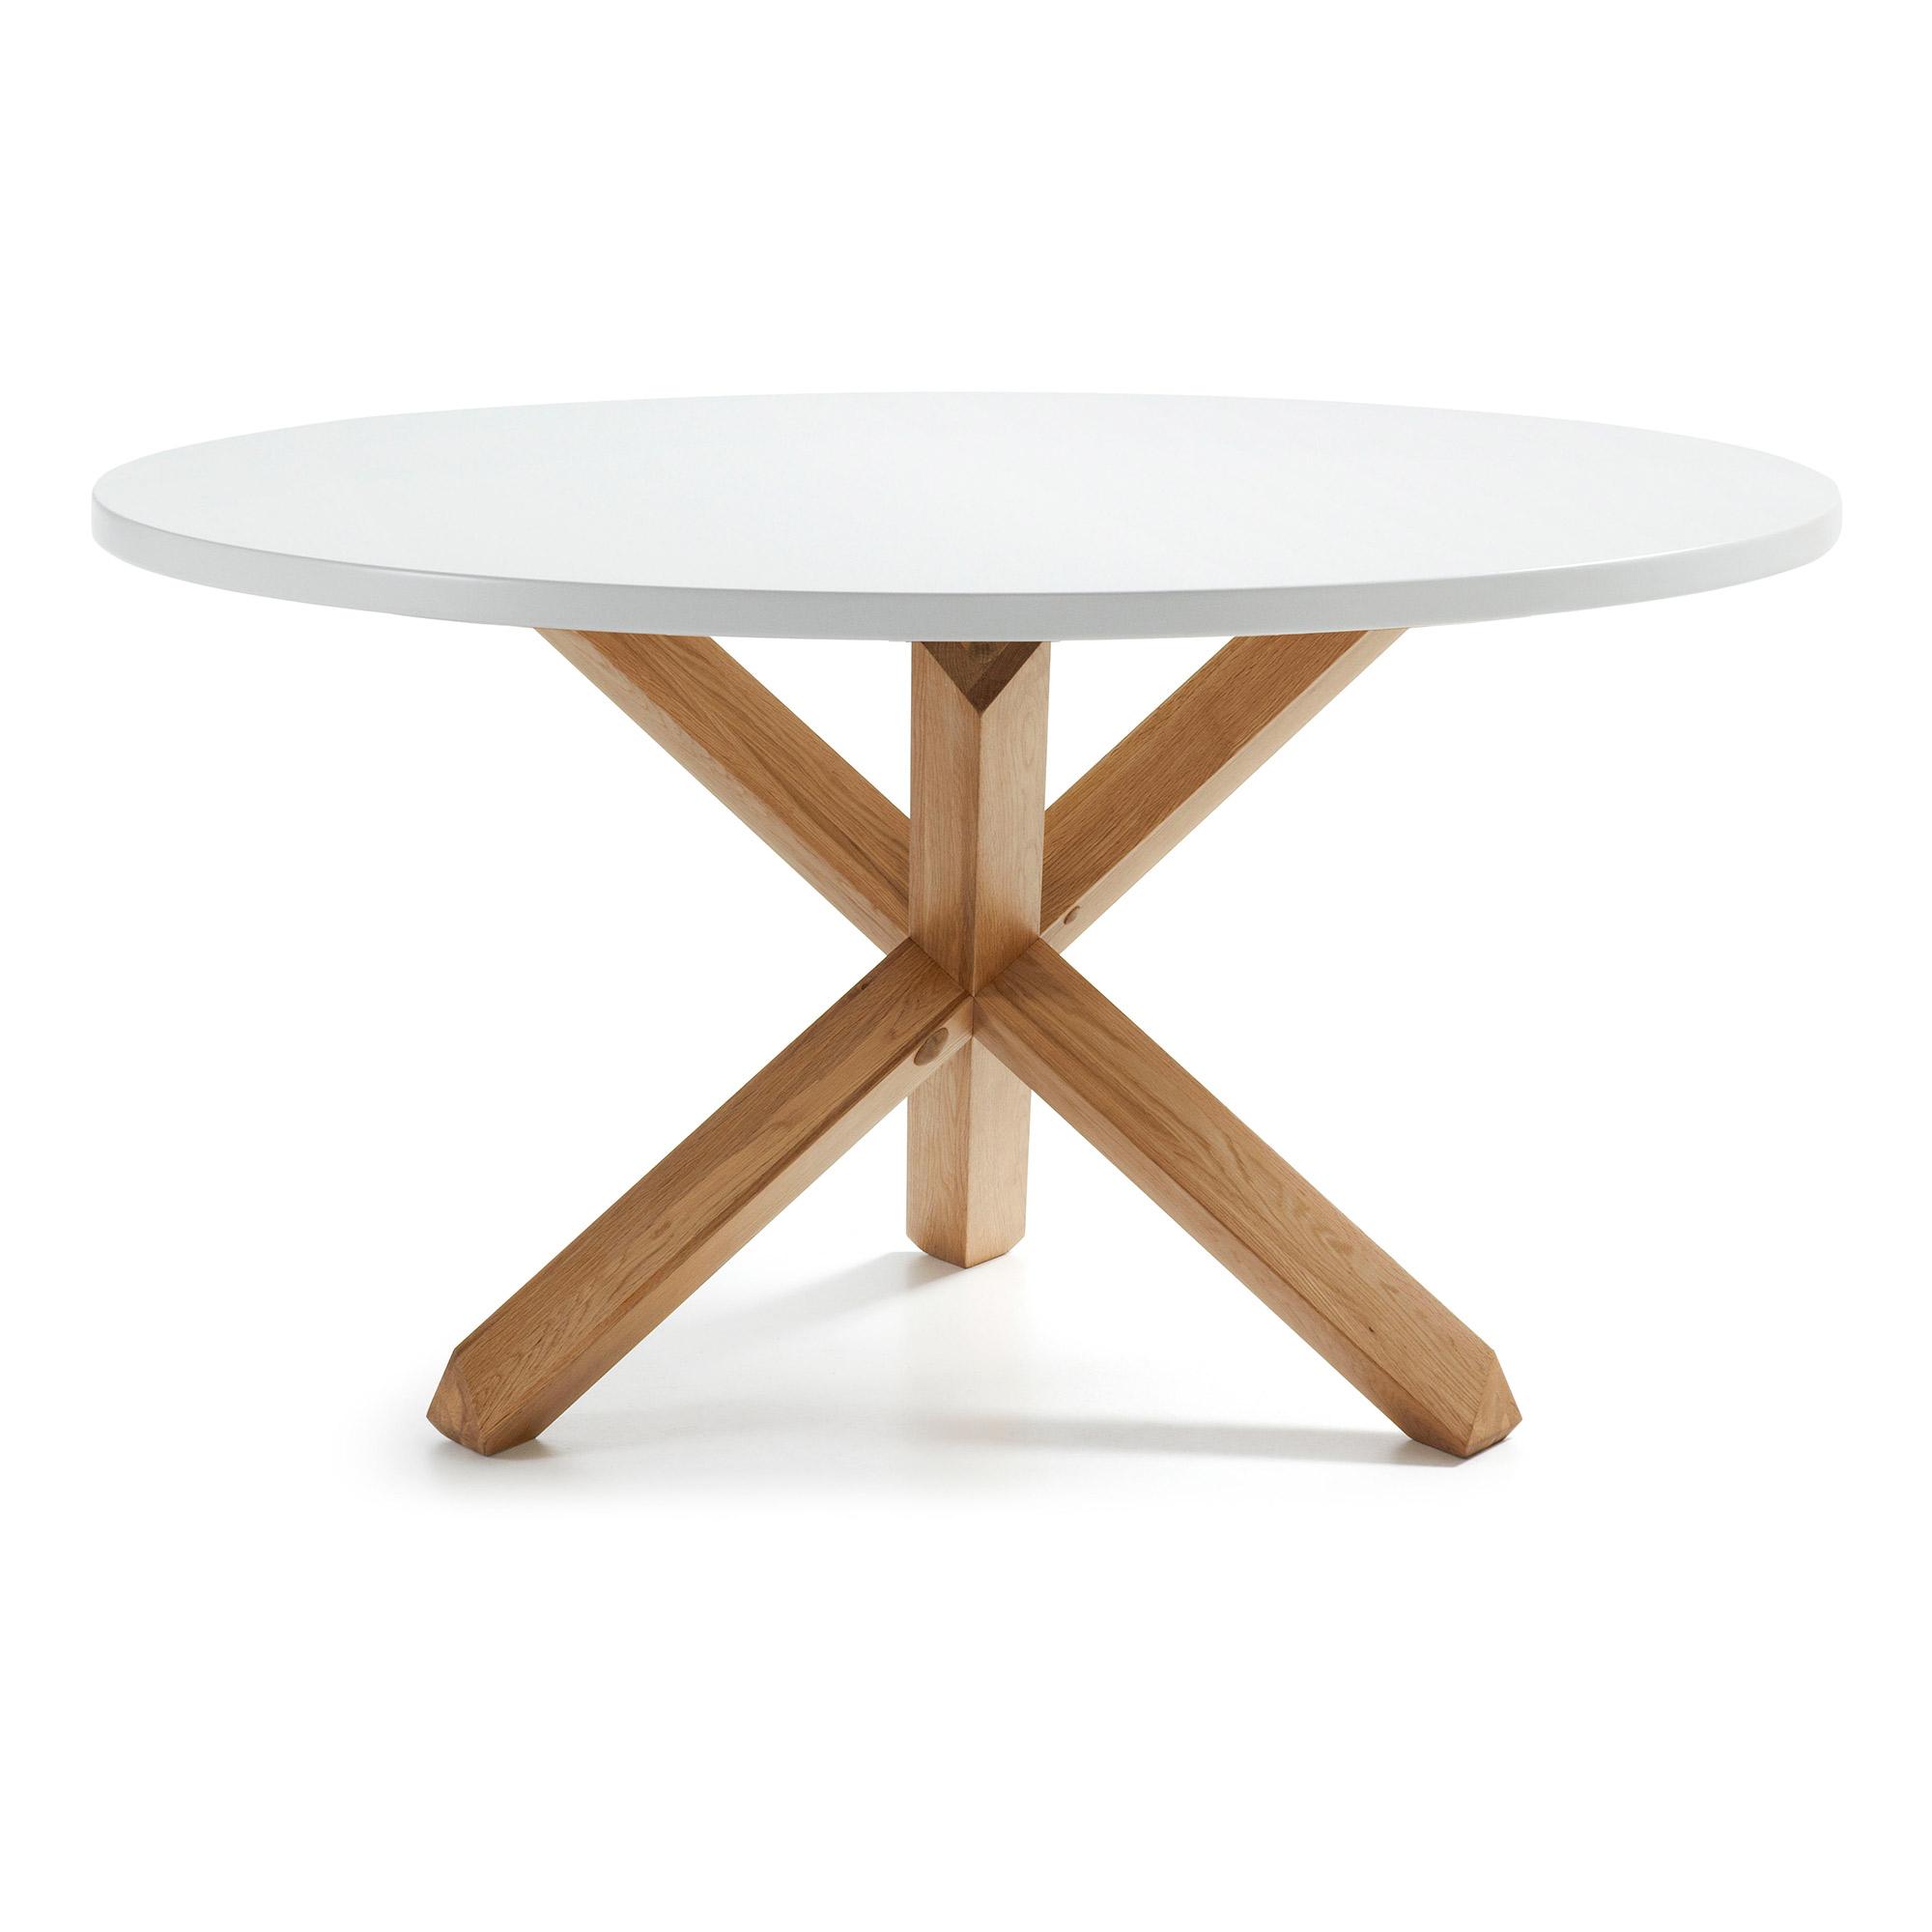 LAFORMA Nori spisebord - hvid/natur MDF/egetræ, rund (Ø135)